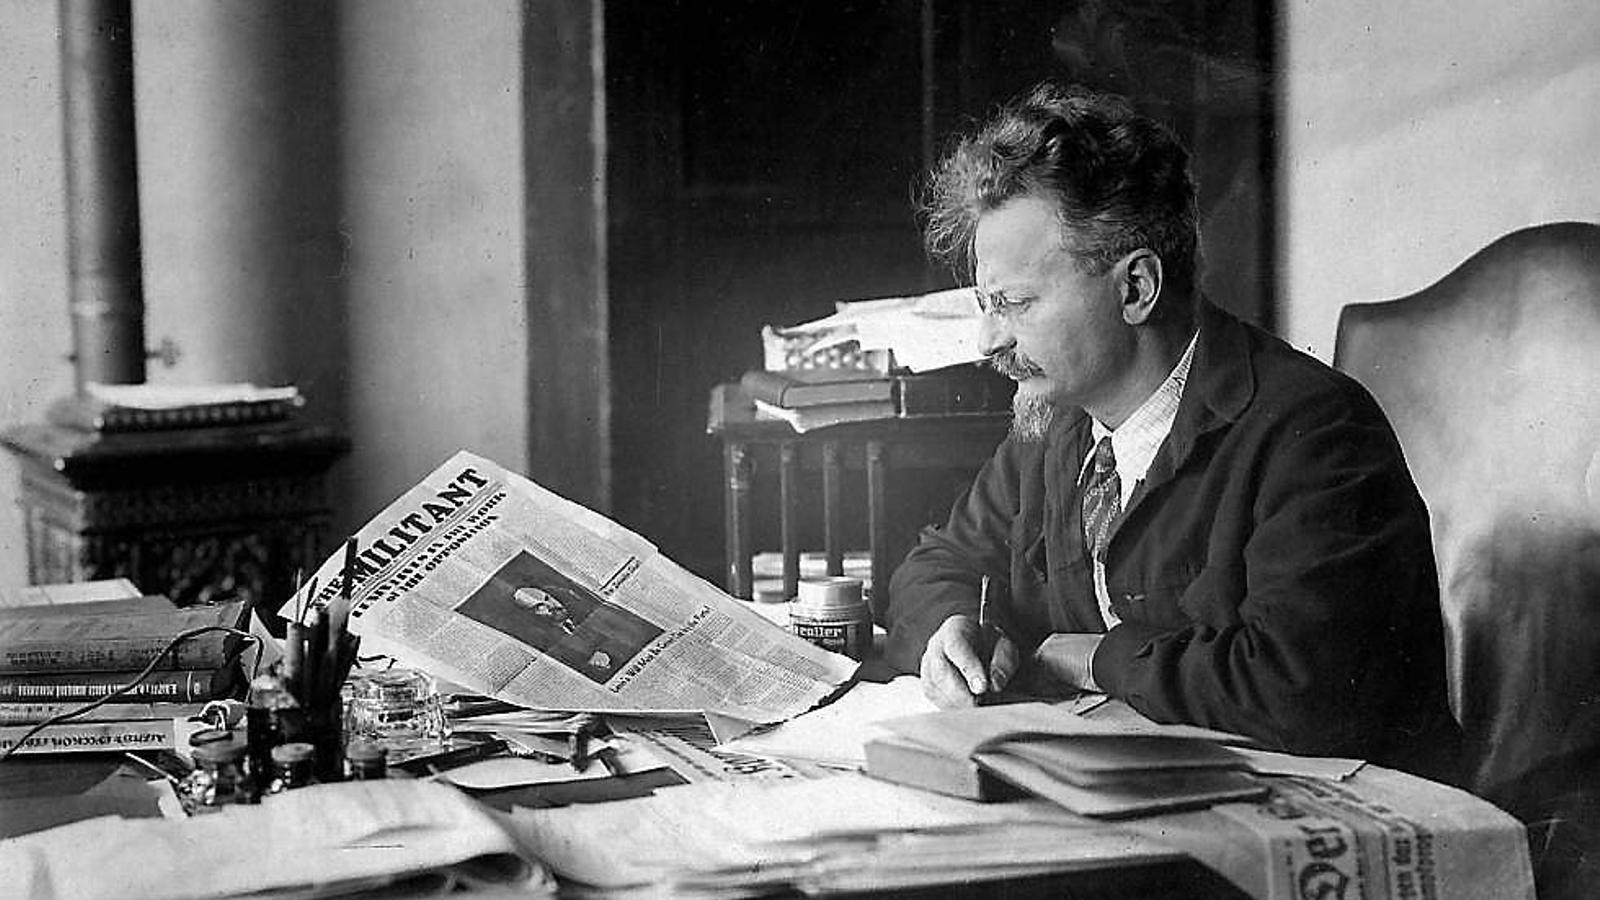 La vida y la muerte de León Trotsky